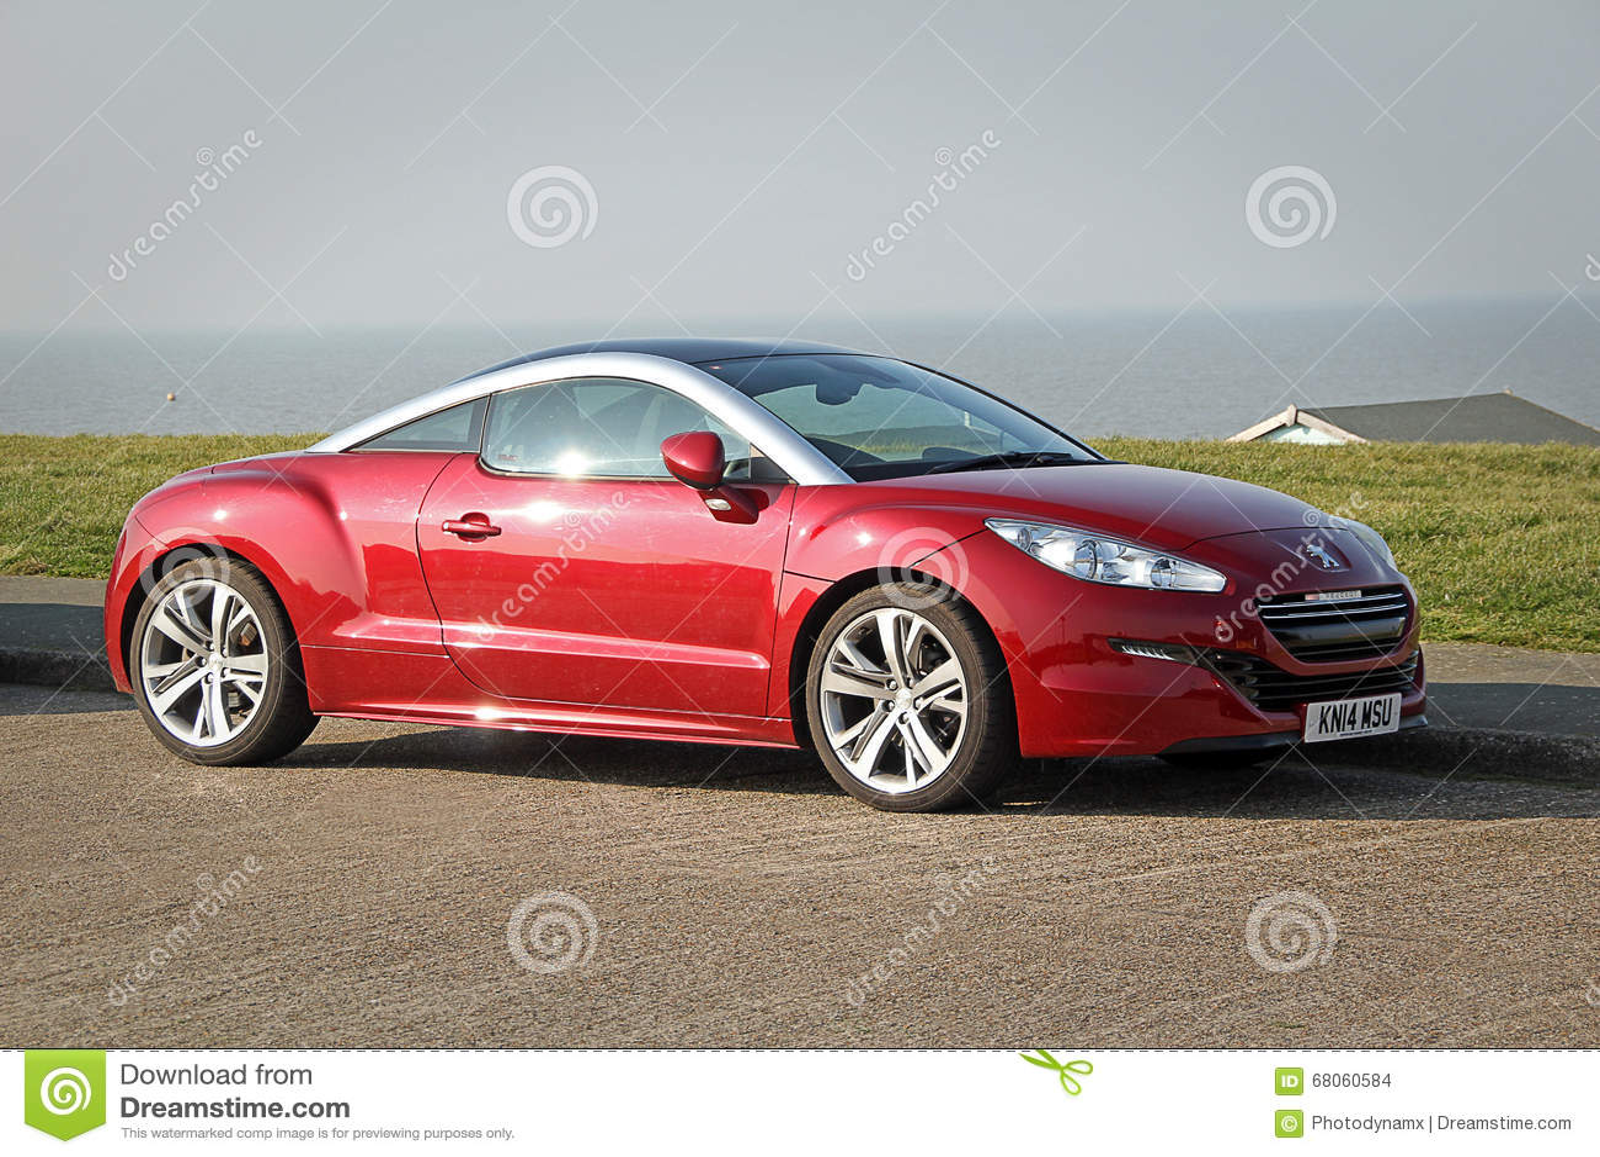 Peugeot rcz coupe